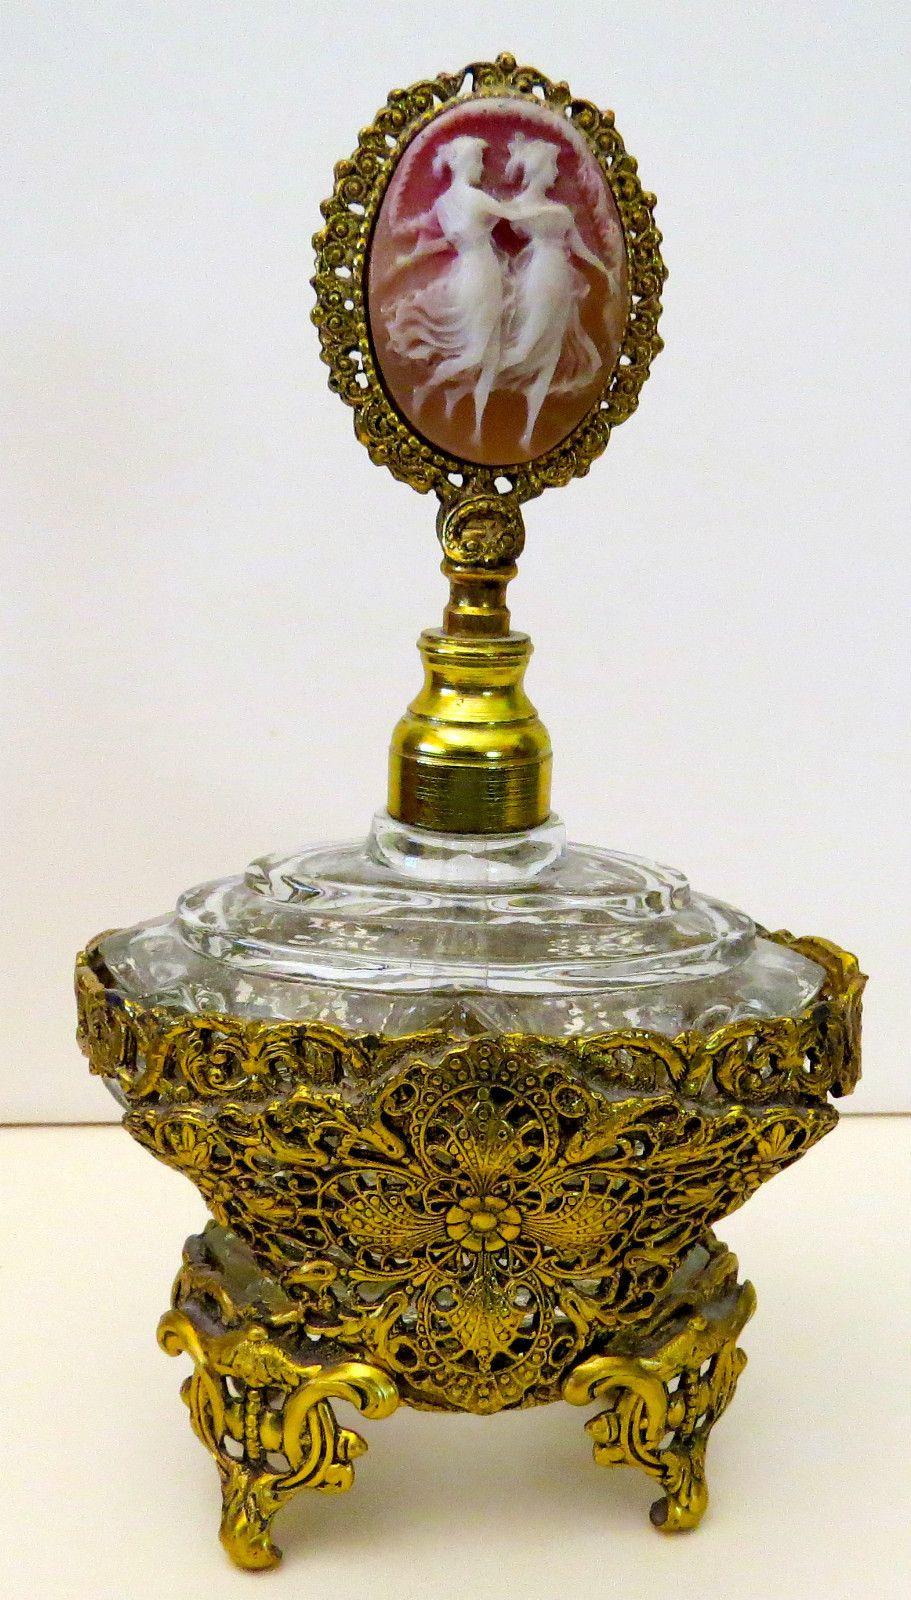 Antique Vintage Ornate Gold Filigree Ormolu Glass Perfume Bottle | eBay